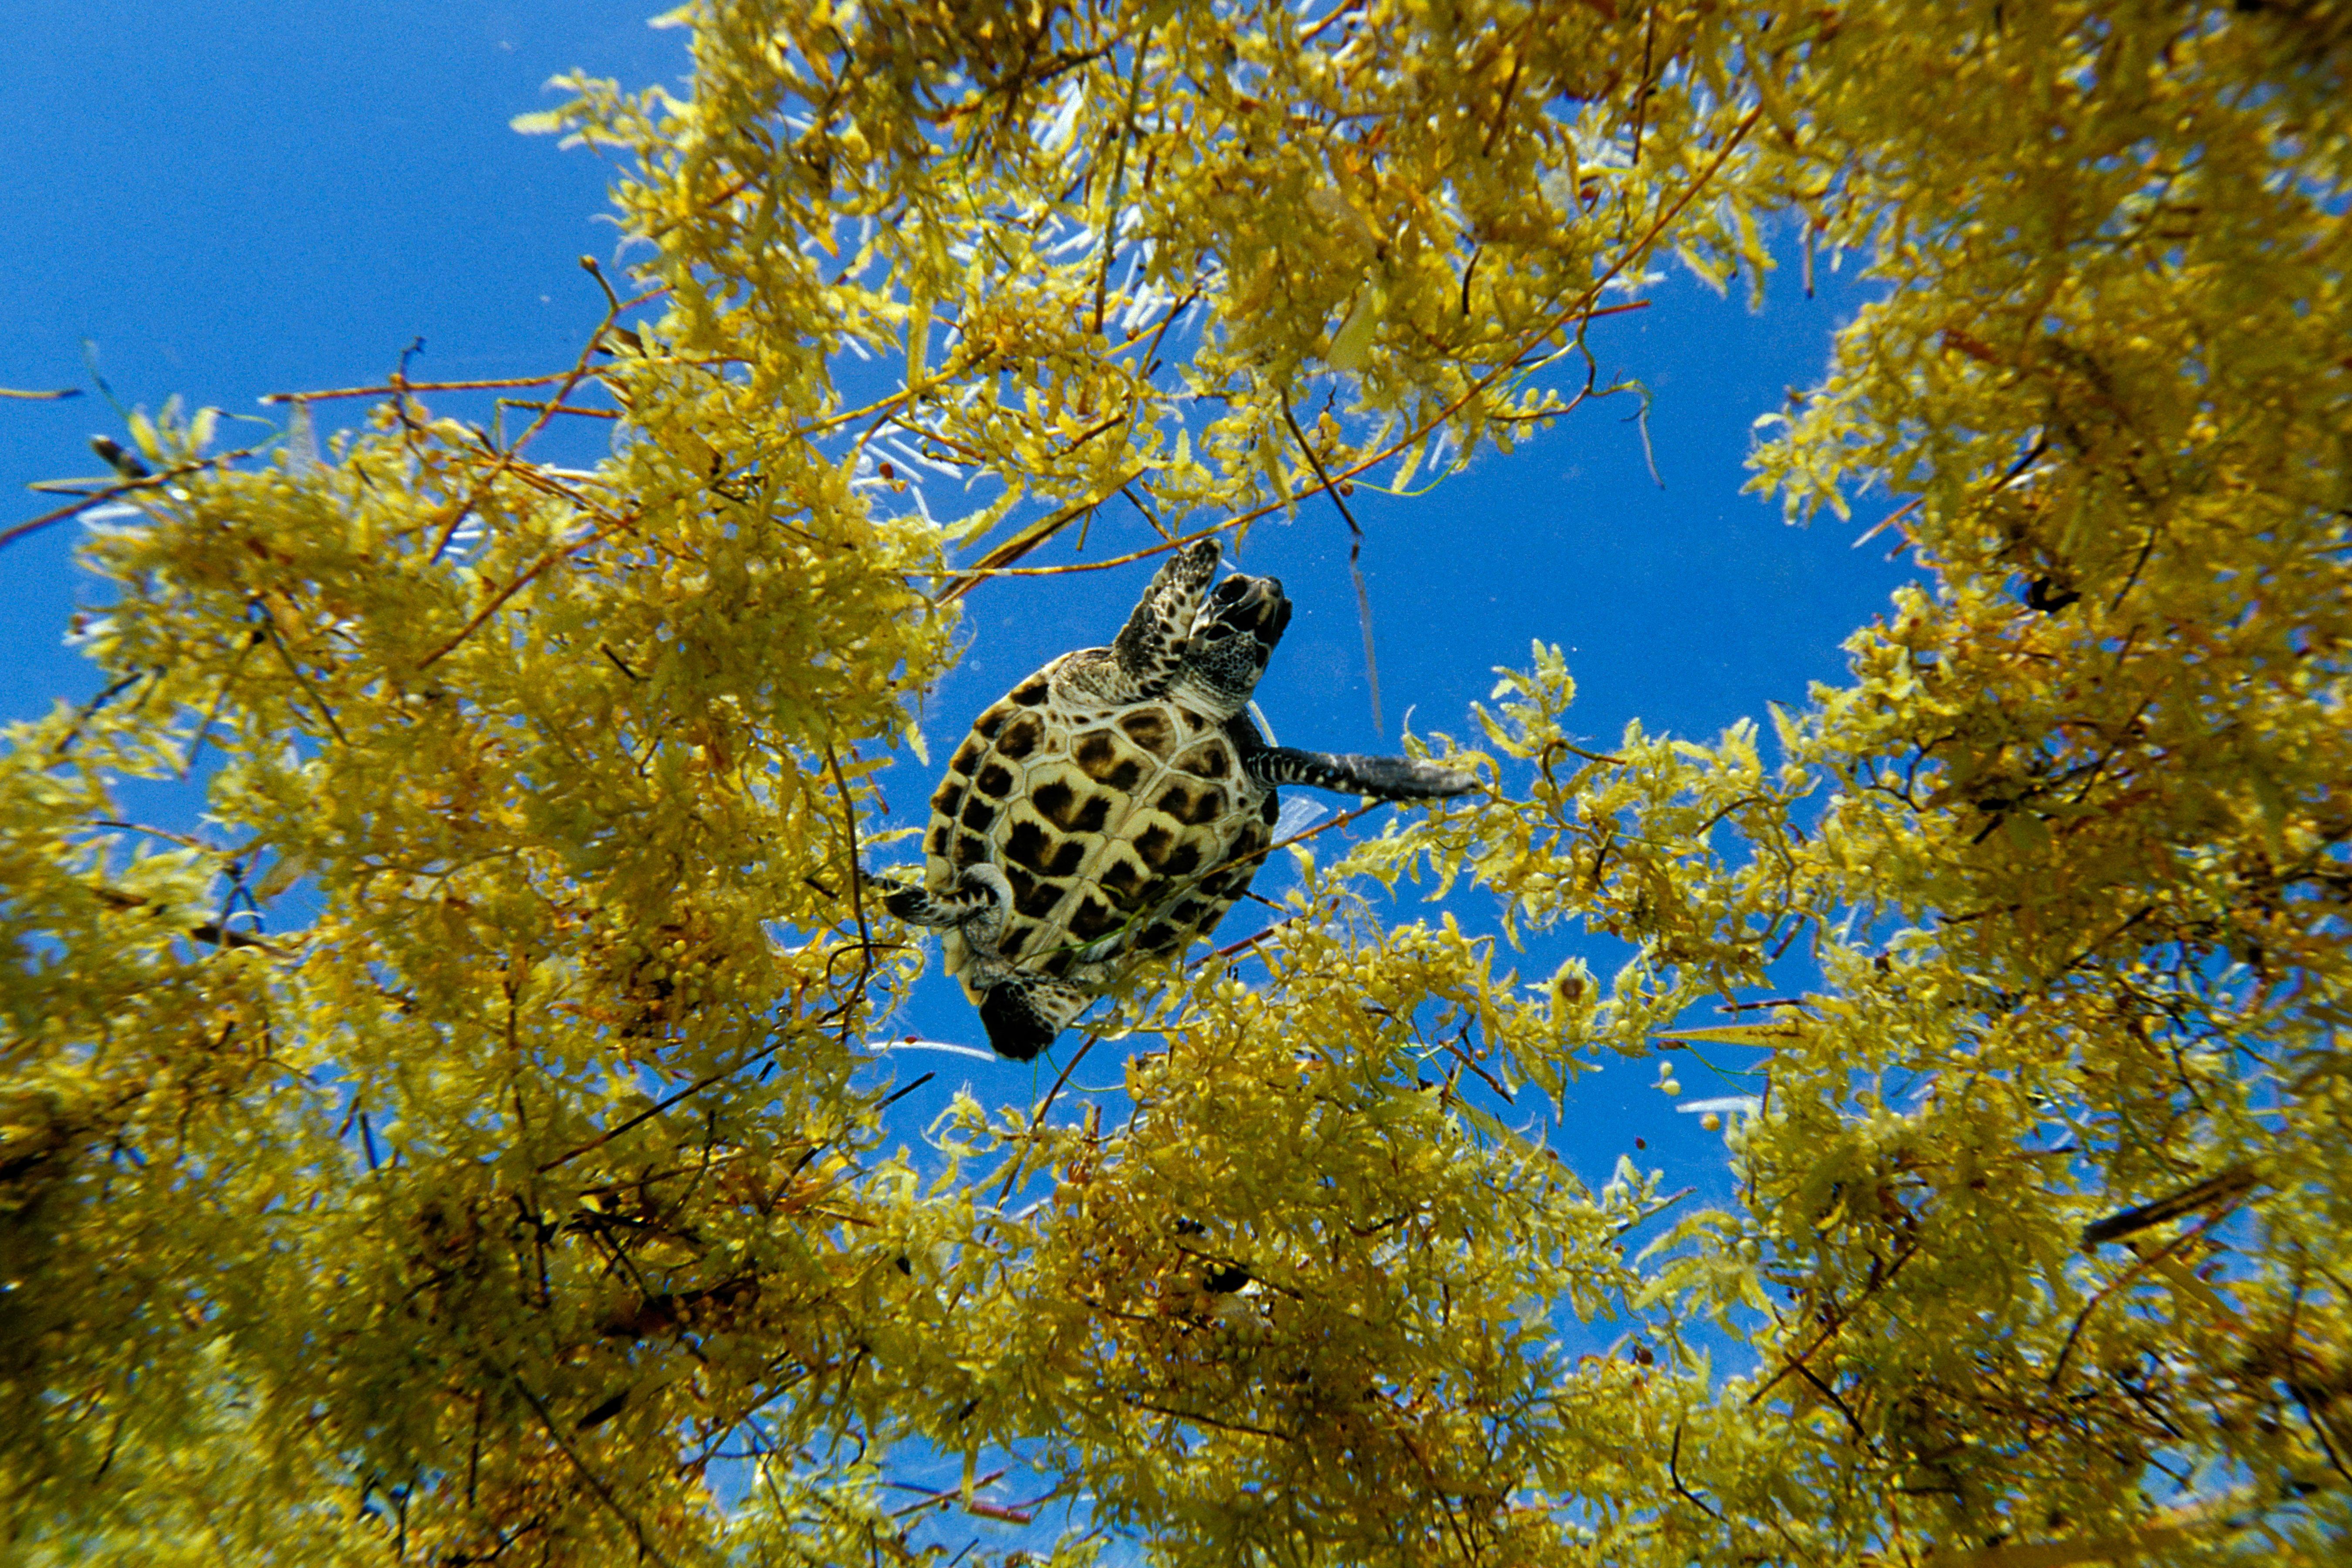 Hawksbill turtle in sargassum weed